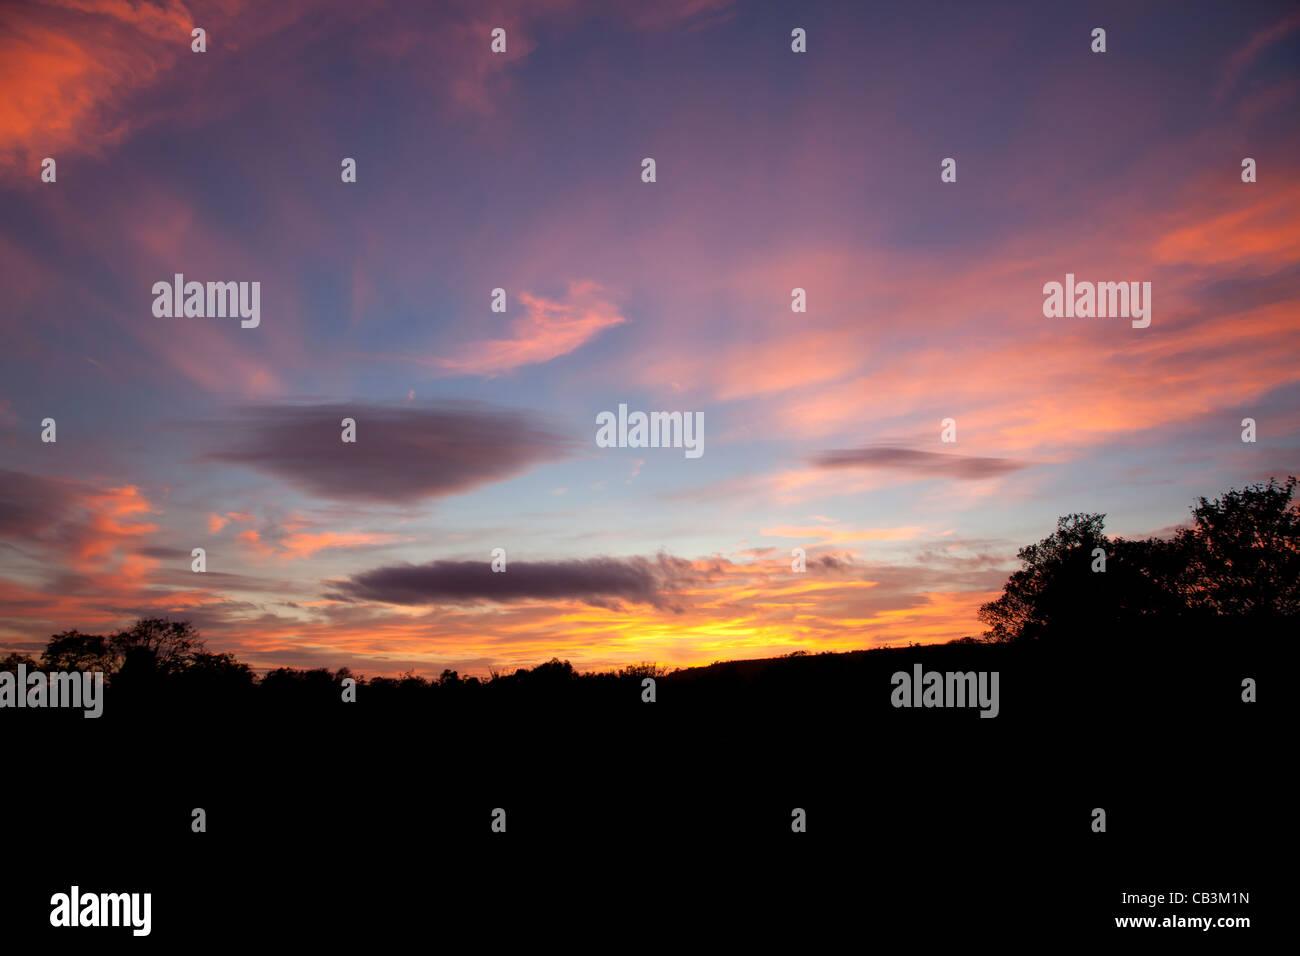 sunset-over-arun-valley-CB3M1N.jpg